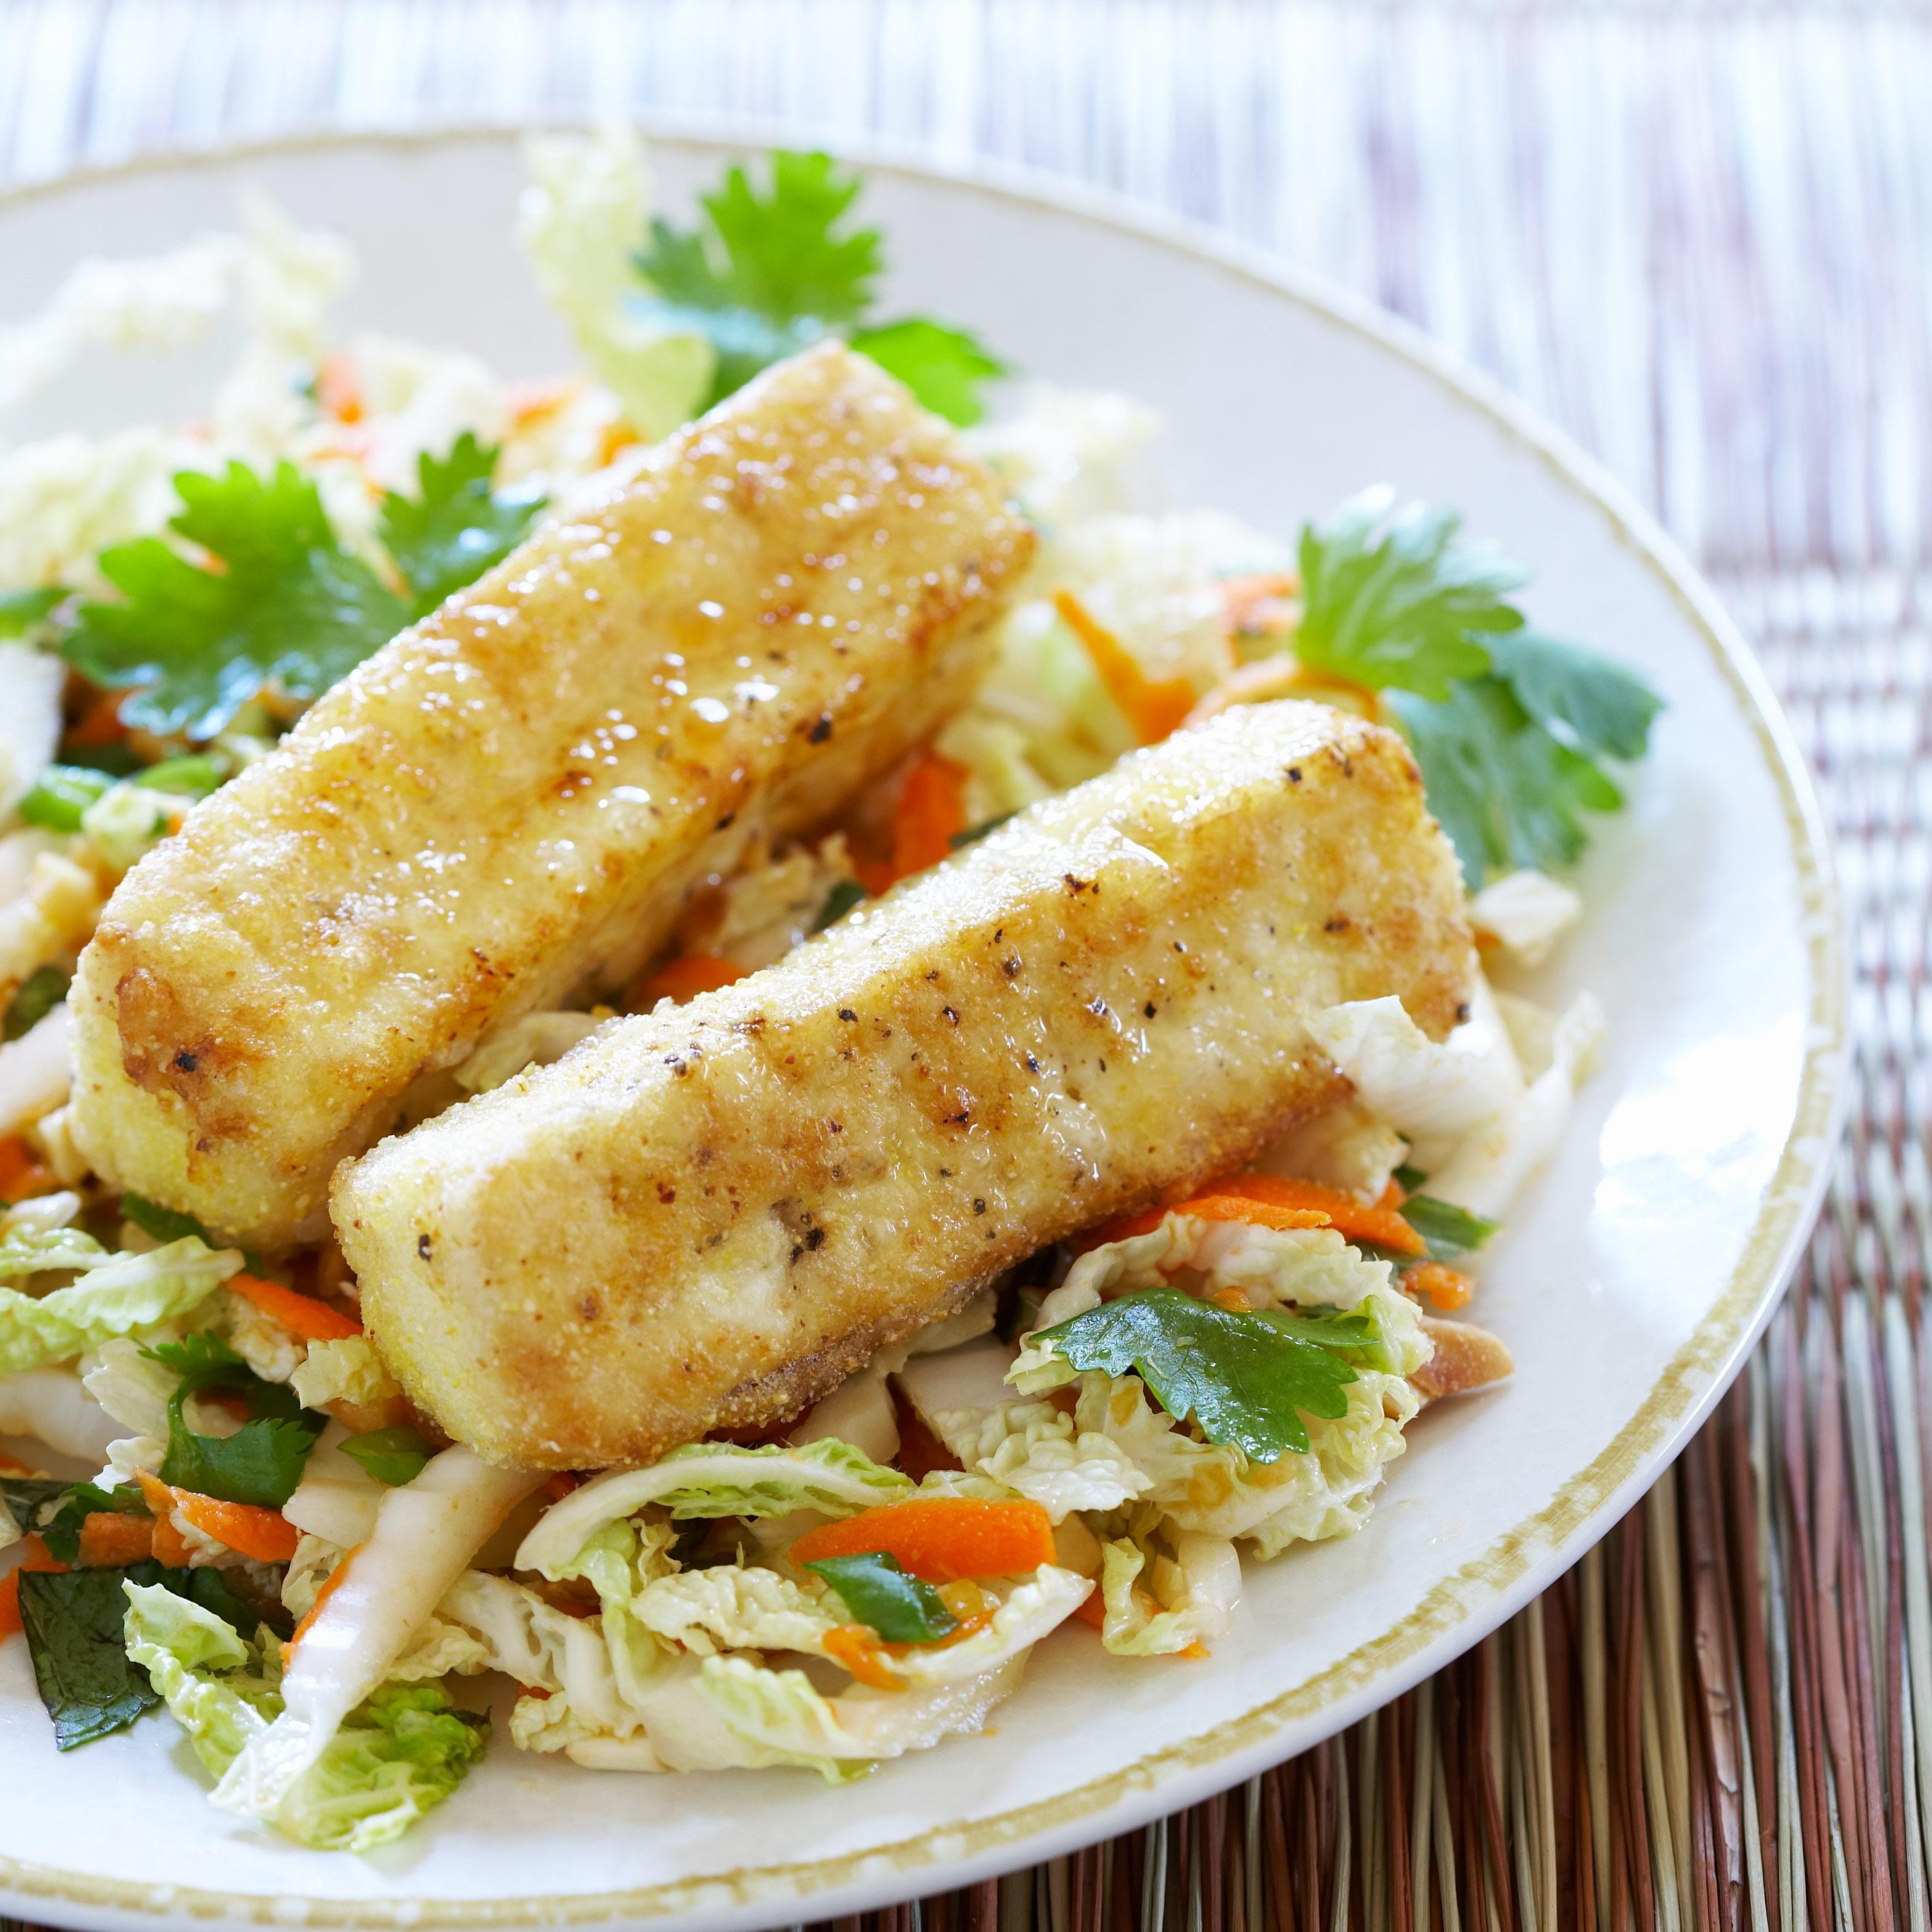 Warm Cabbage Salad with Crispy Tofu Recipe - Cook's Illustrated